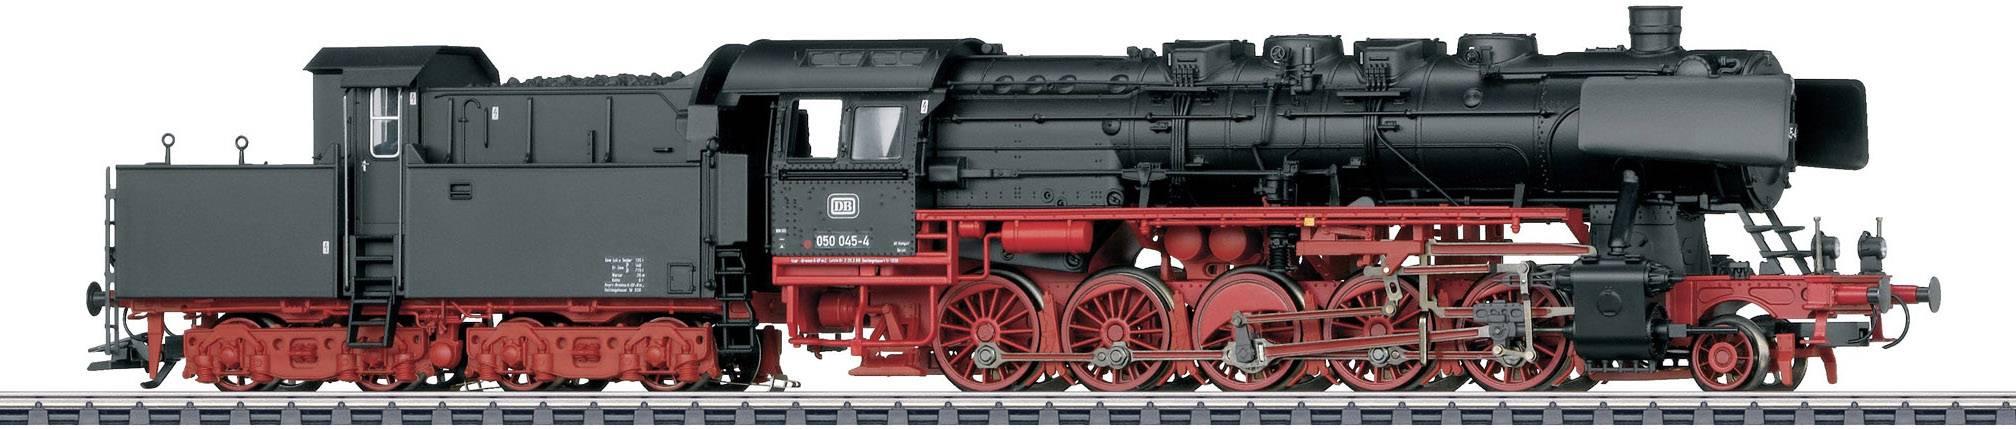 Märklin 37836 Locomotiva a vapore per merci BR 050 della DB in scala H0